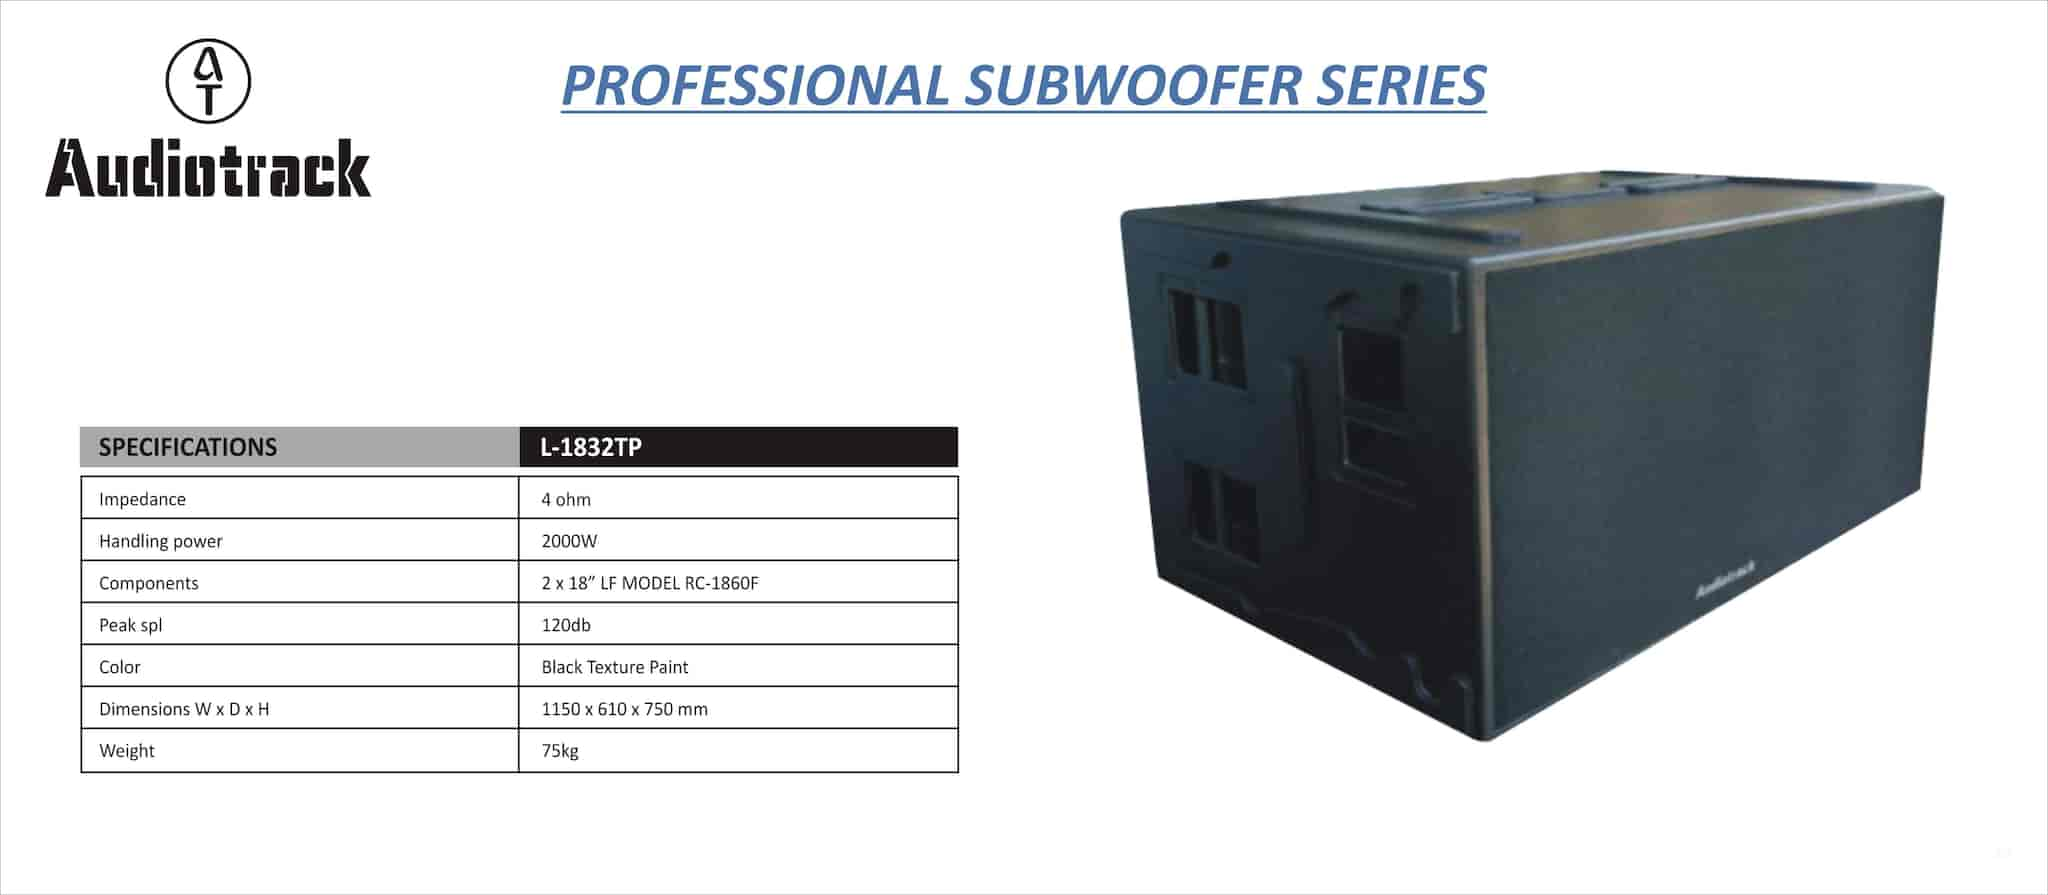 Shiva Shakti Products, Khalsa College - Amplifier Manufacturers in